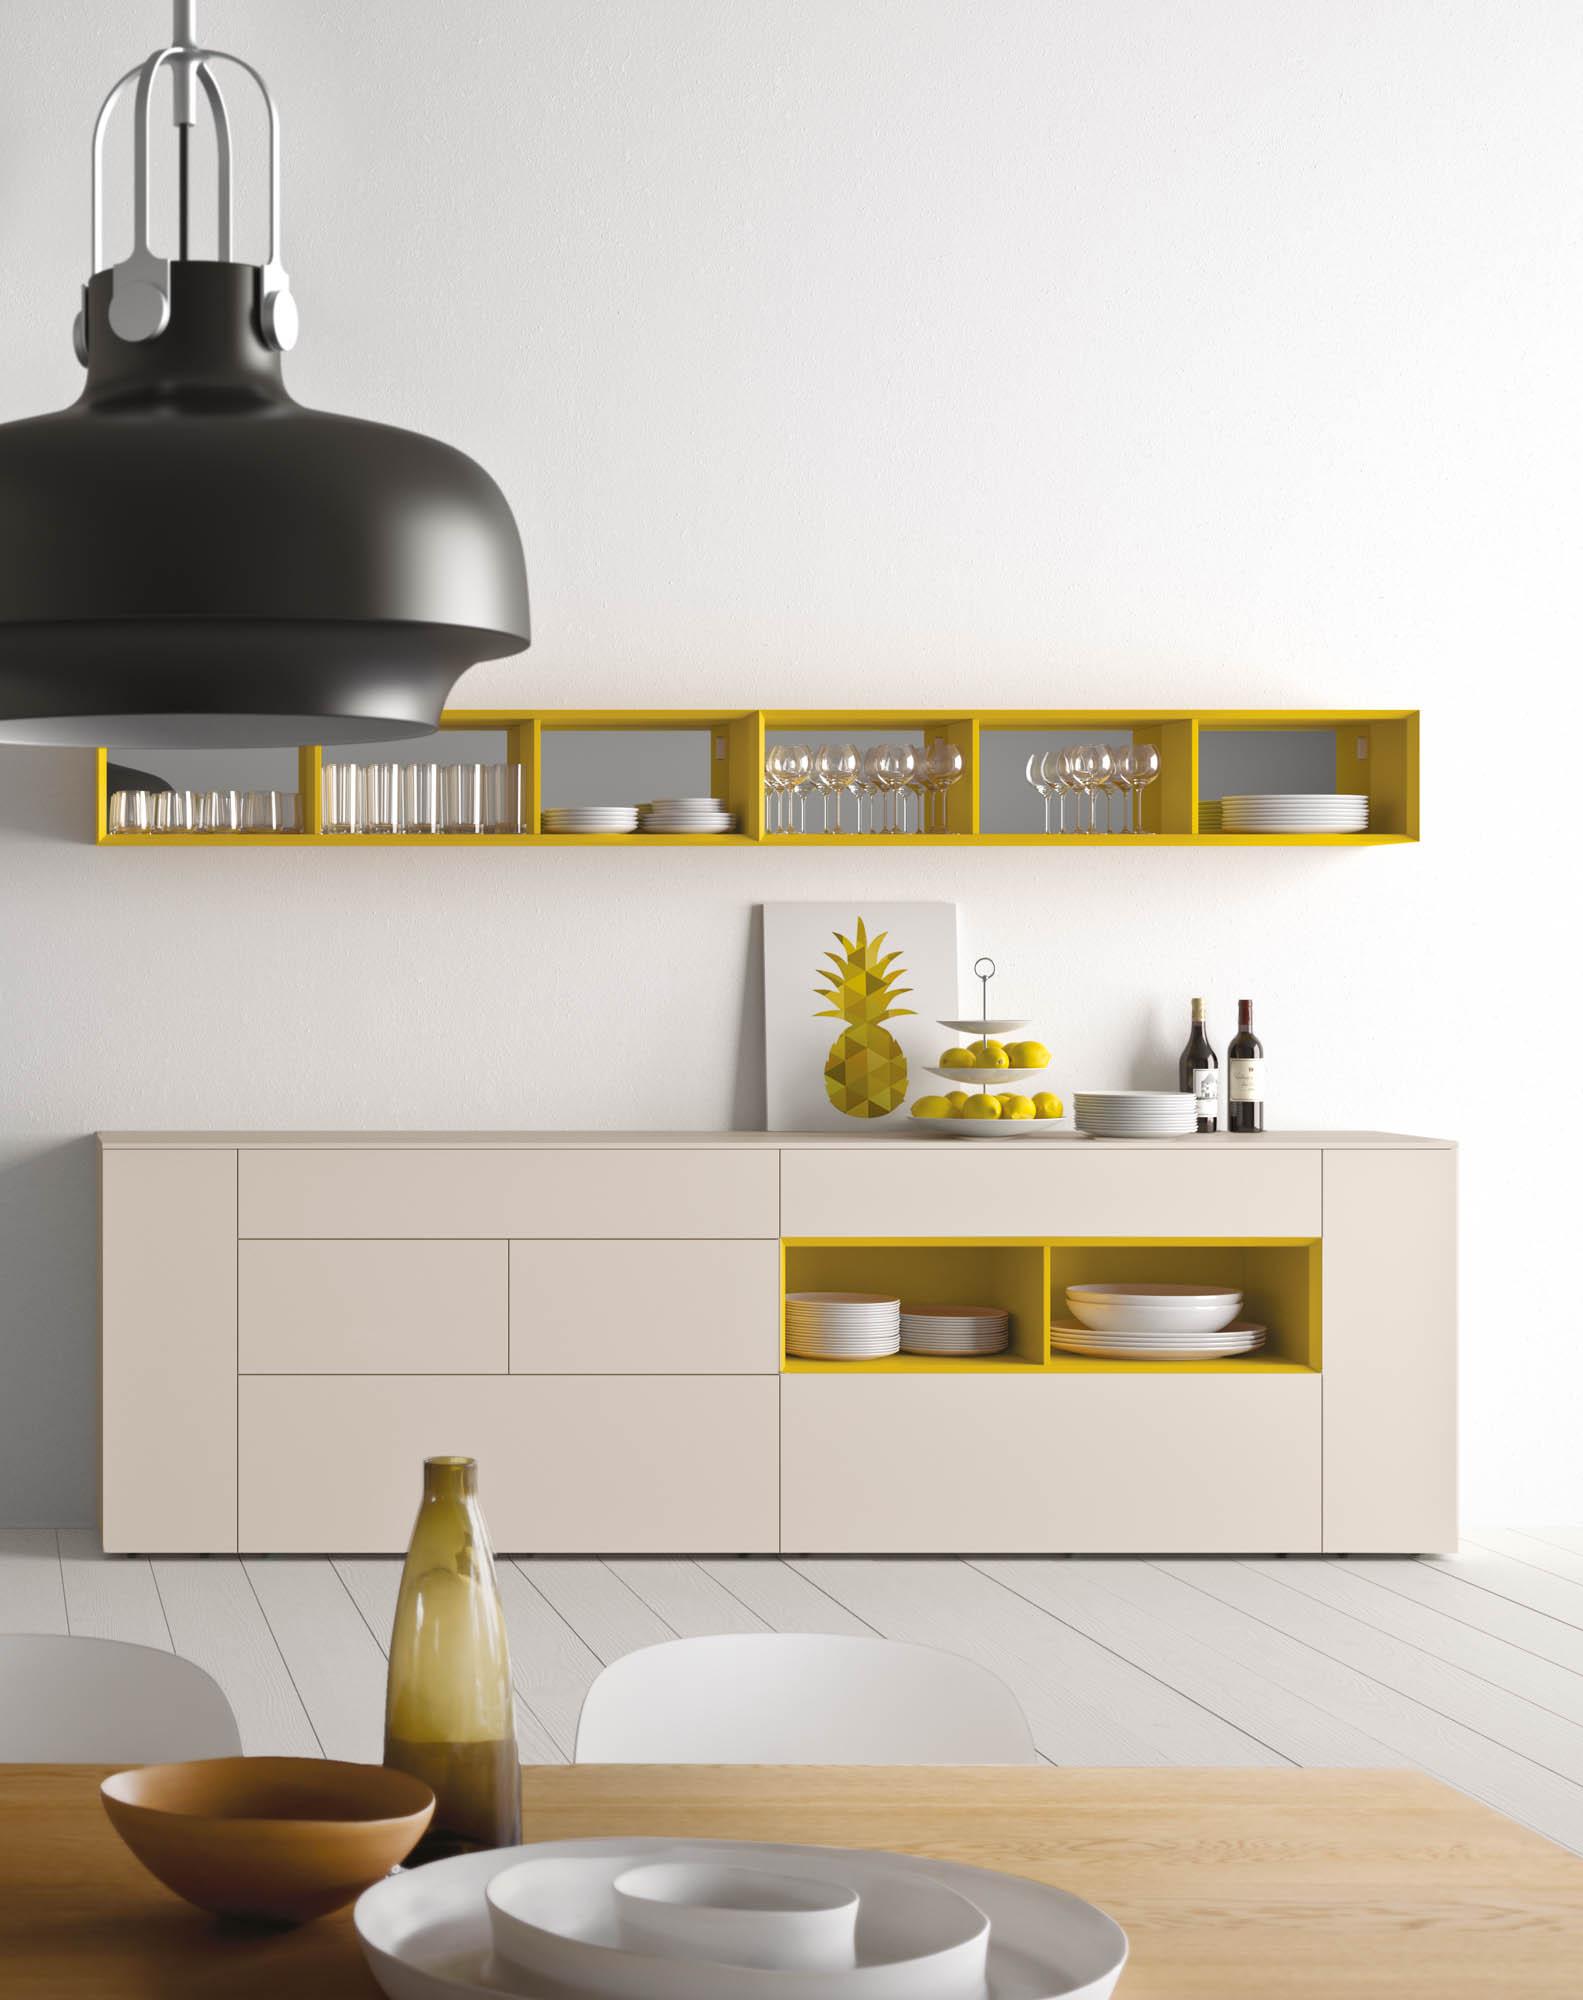 Spazio Sideboard_Madia S306